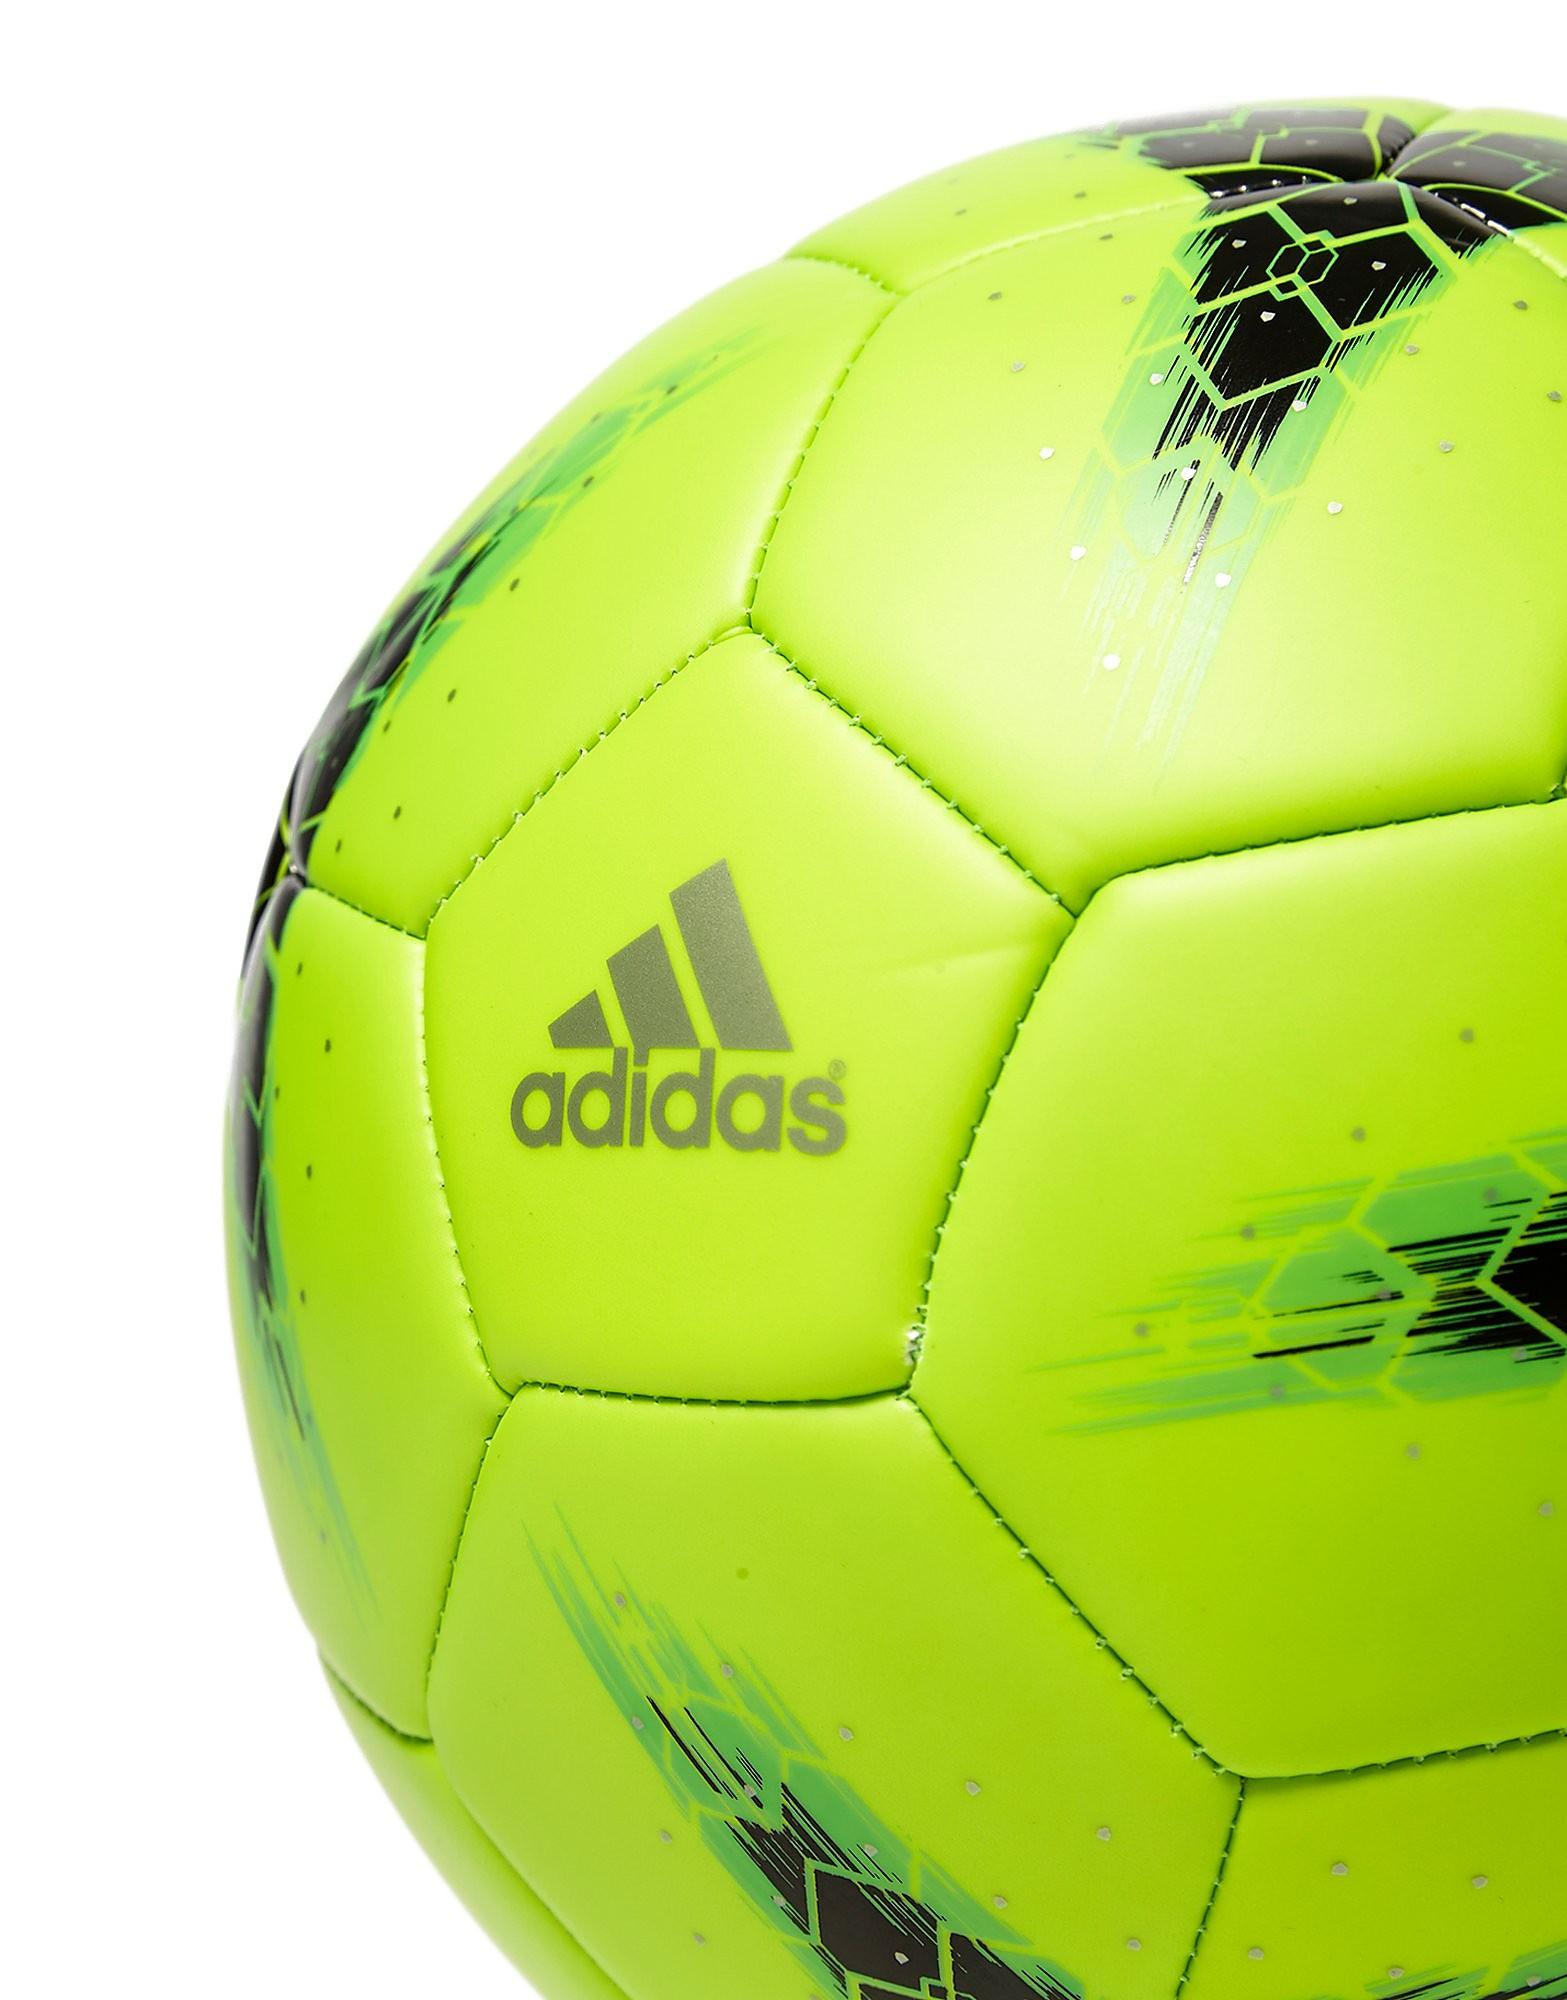 adidas Messi 2016 Solar Football